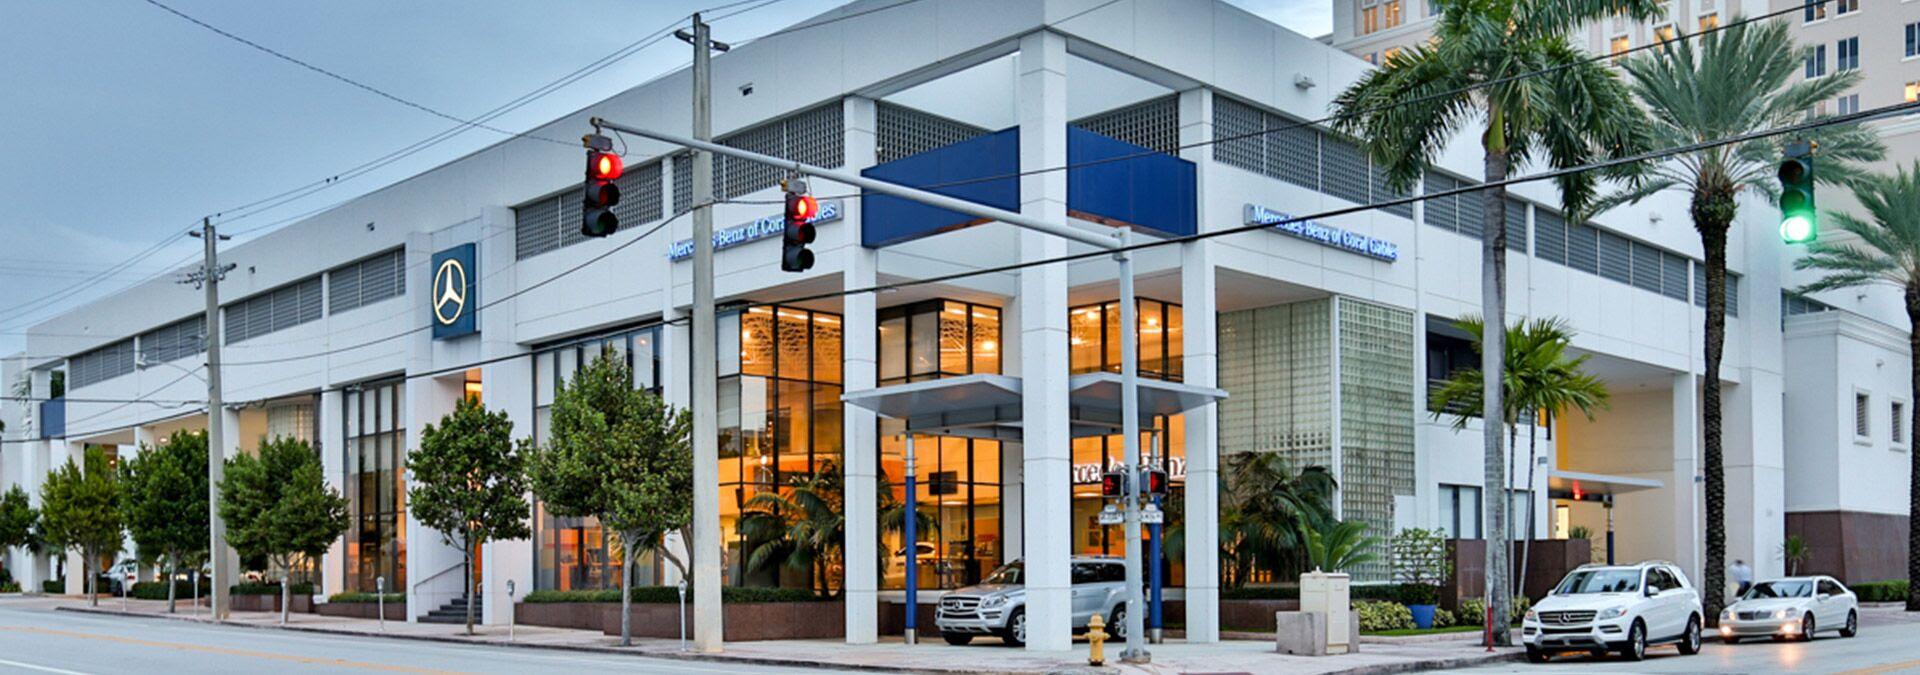 Mercedes-Benz Dealership Miami FL | Used Cars Bill Ussery ...